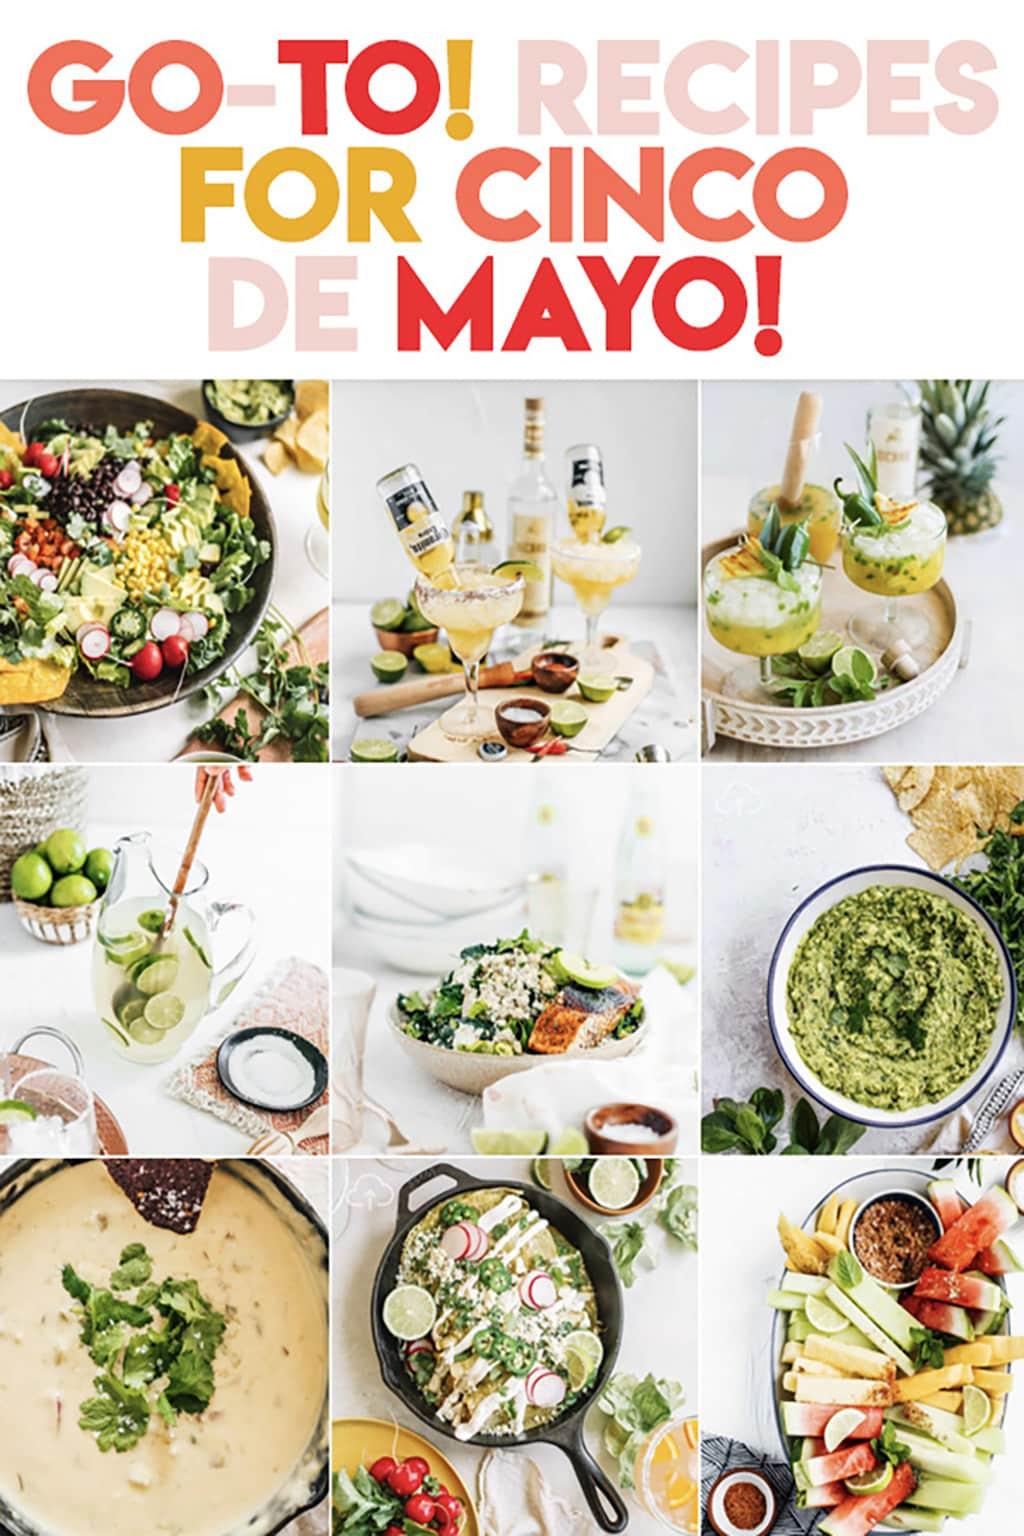 Recipe round up compilation of Top 10 Recipes for Cinco De Mayo.